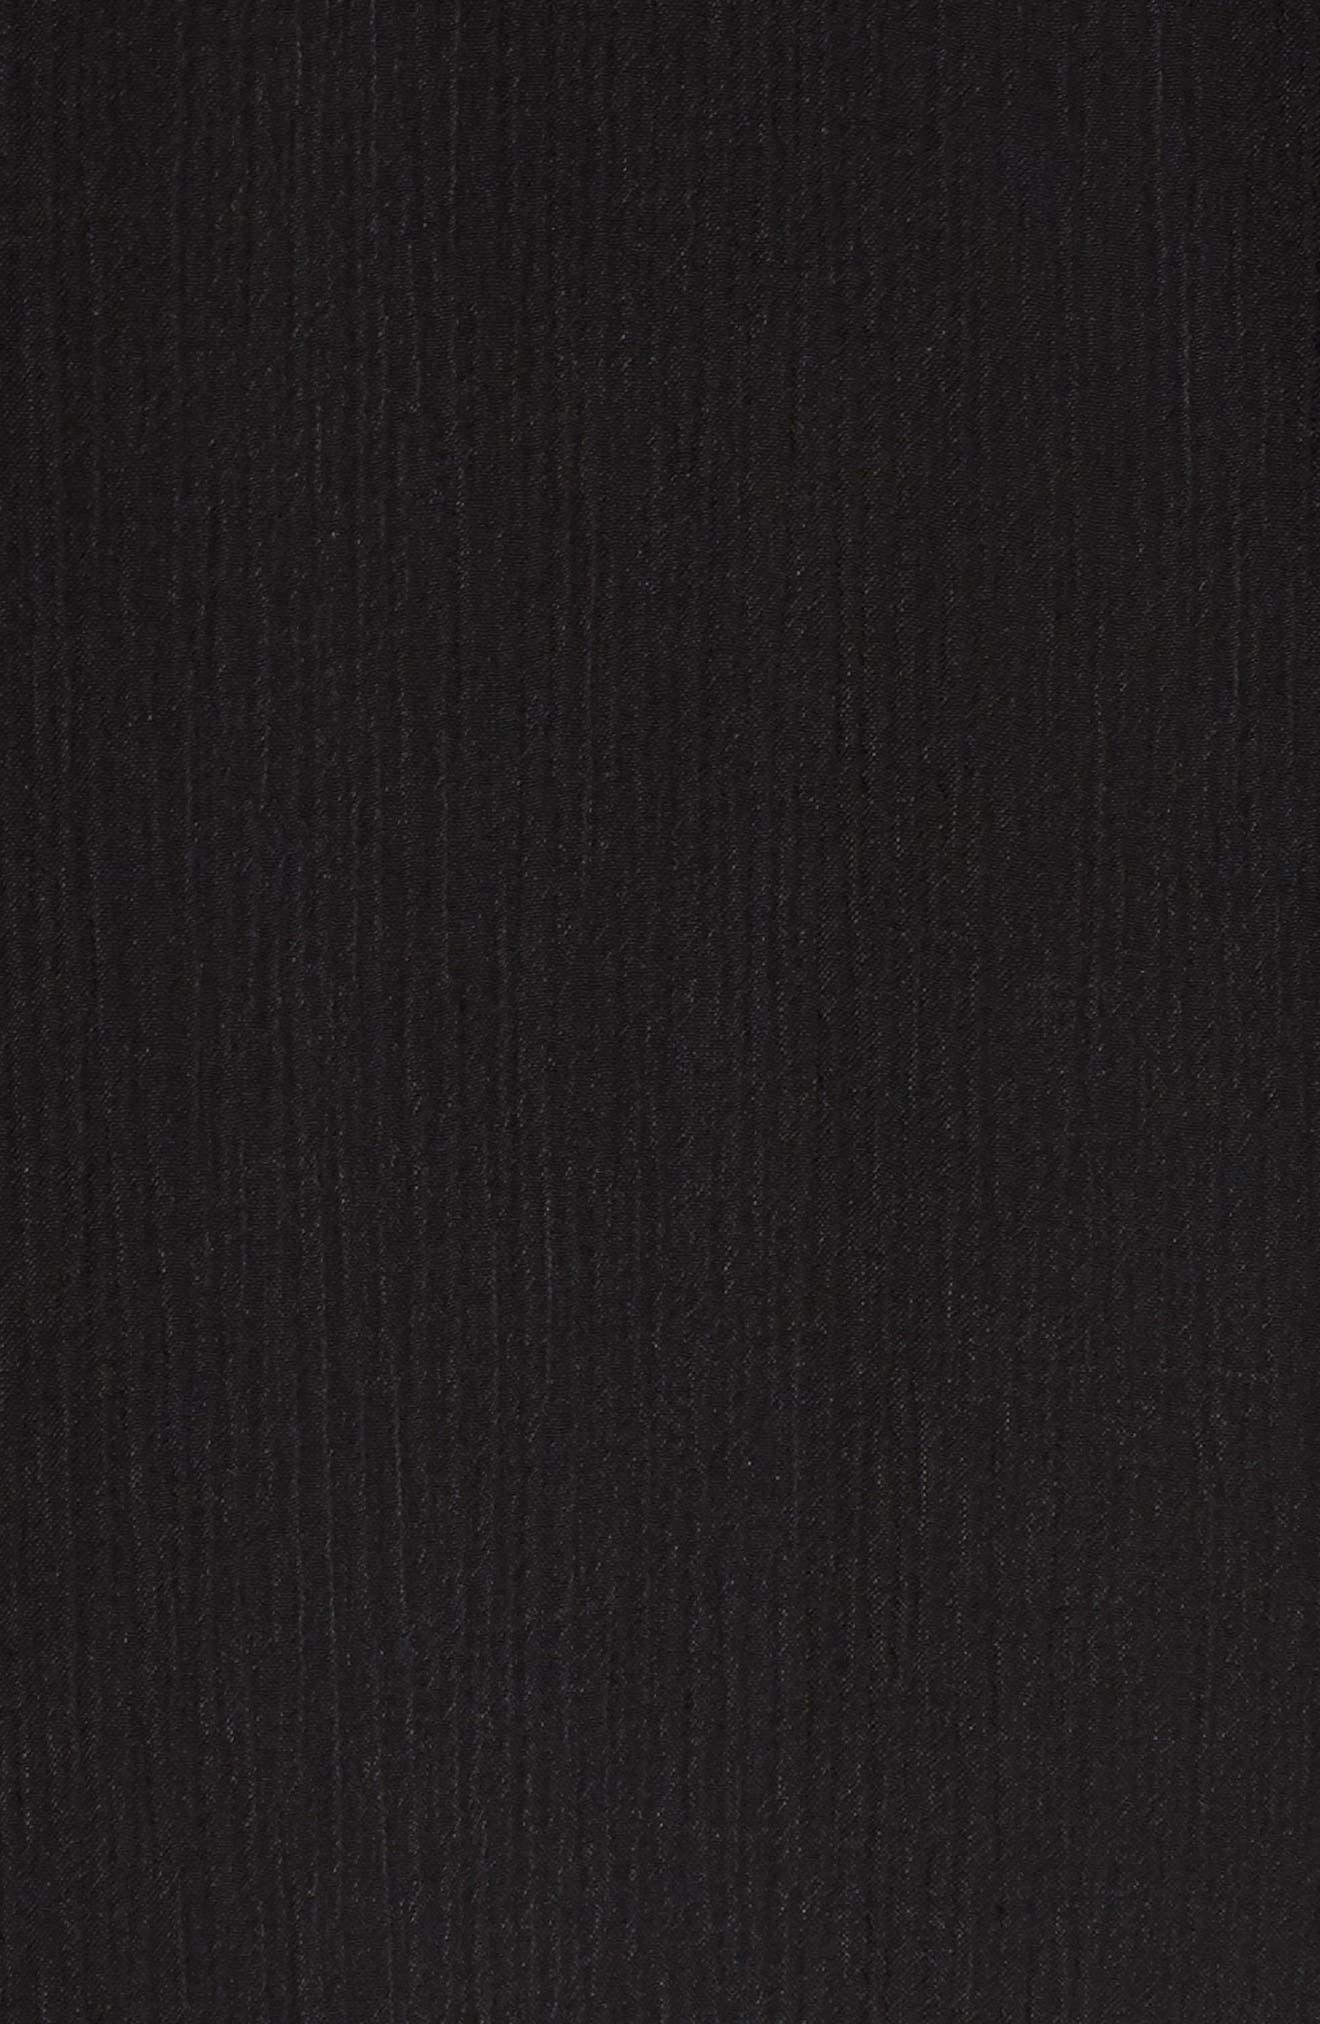 Choker Neck Wrap Dress,                             Alternate thumbnail 5, color,                             001